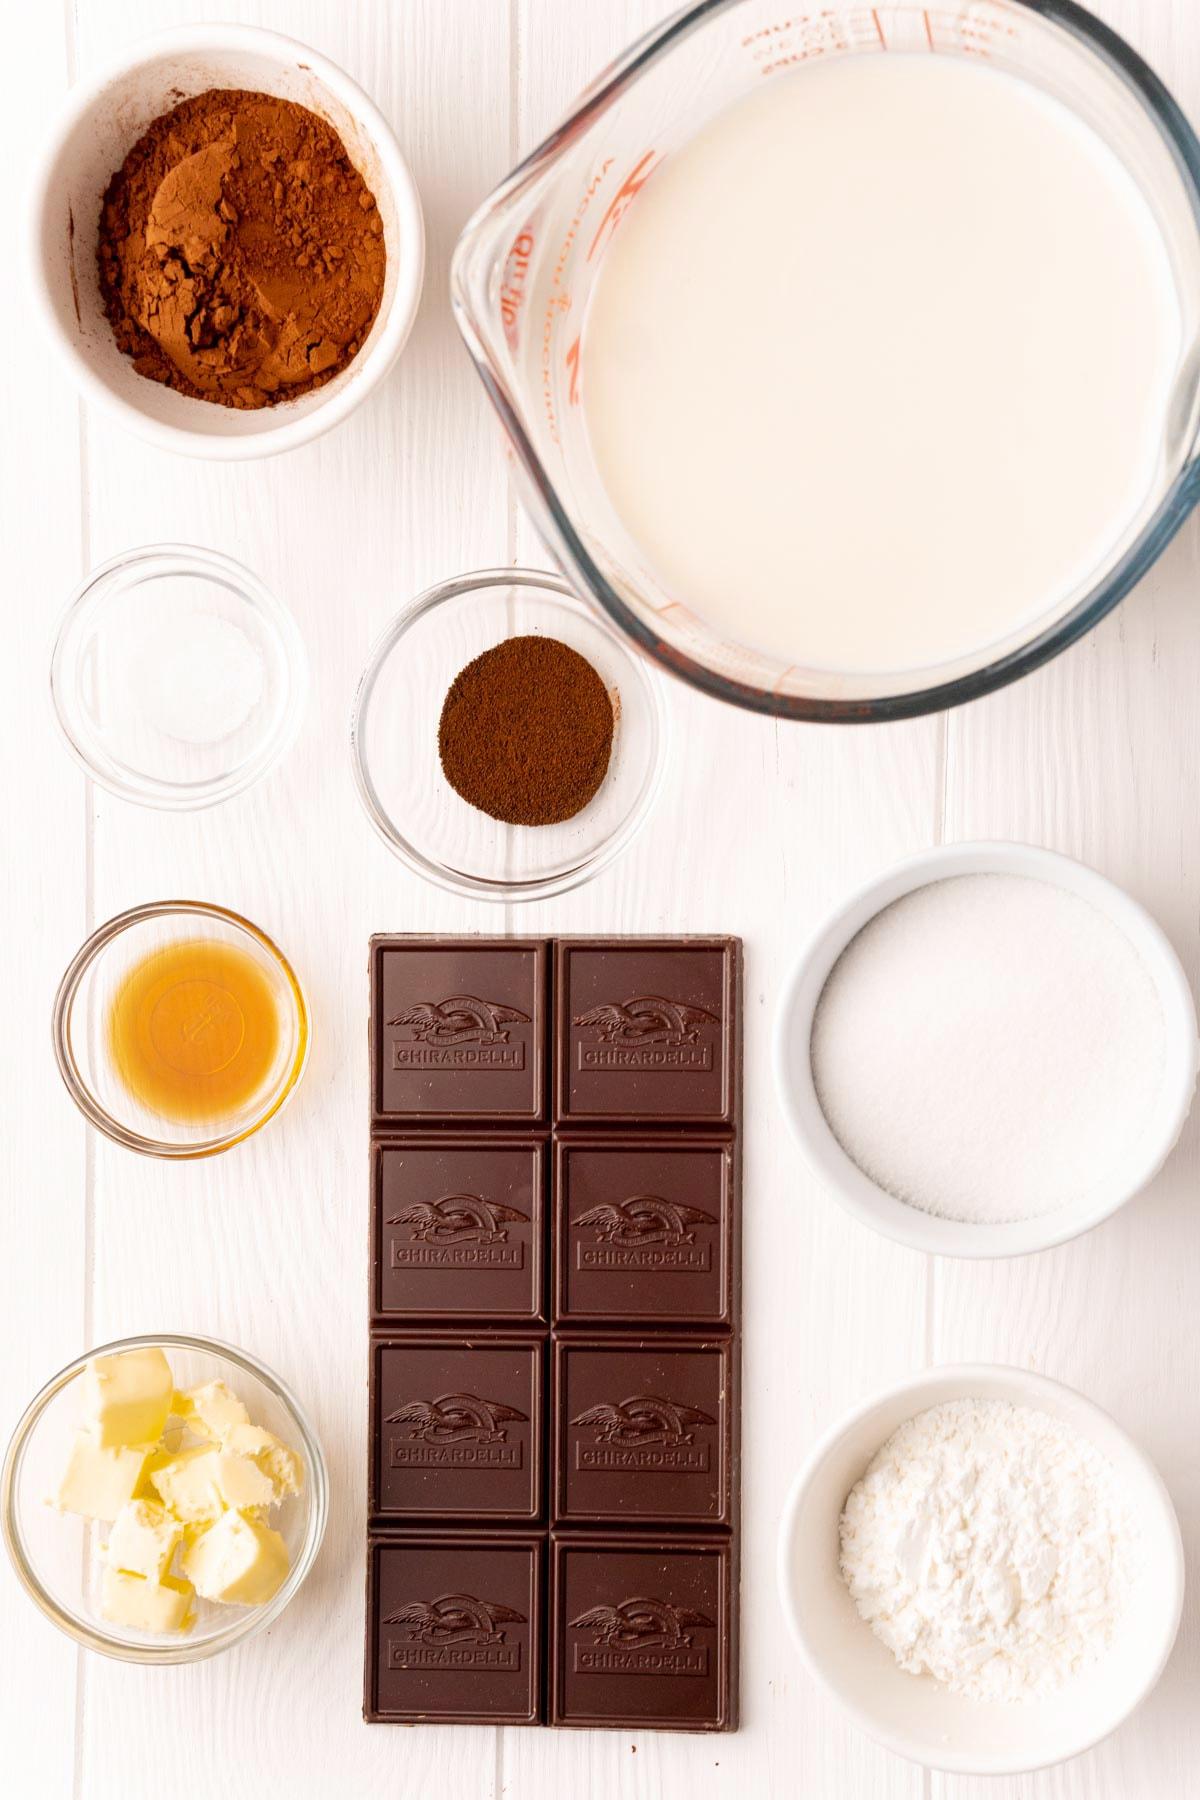 The ingredients needed to make chocolate pudding, cocoa powder, milk, sugar, vanilla, butter, cornstarch, espresso powder, and salt.